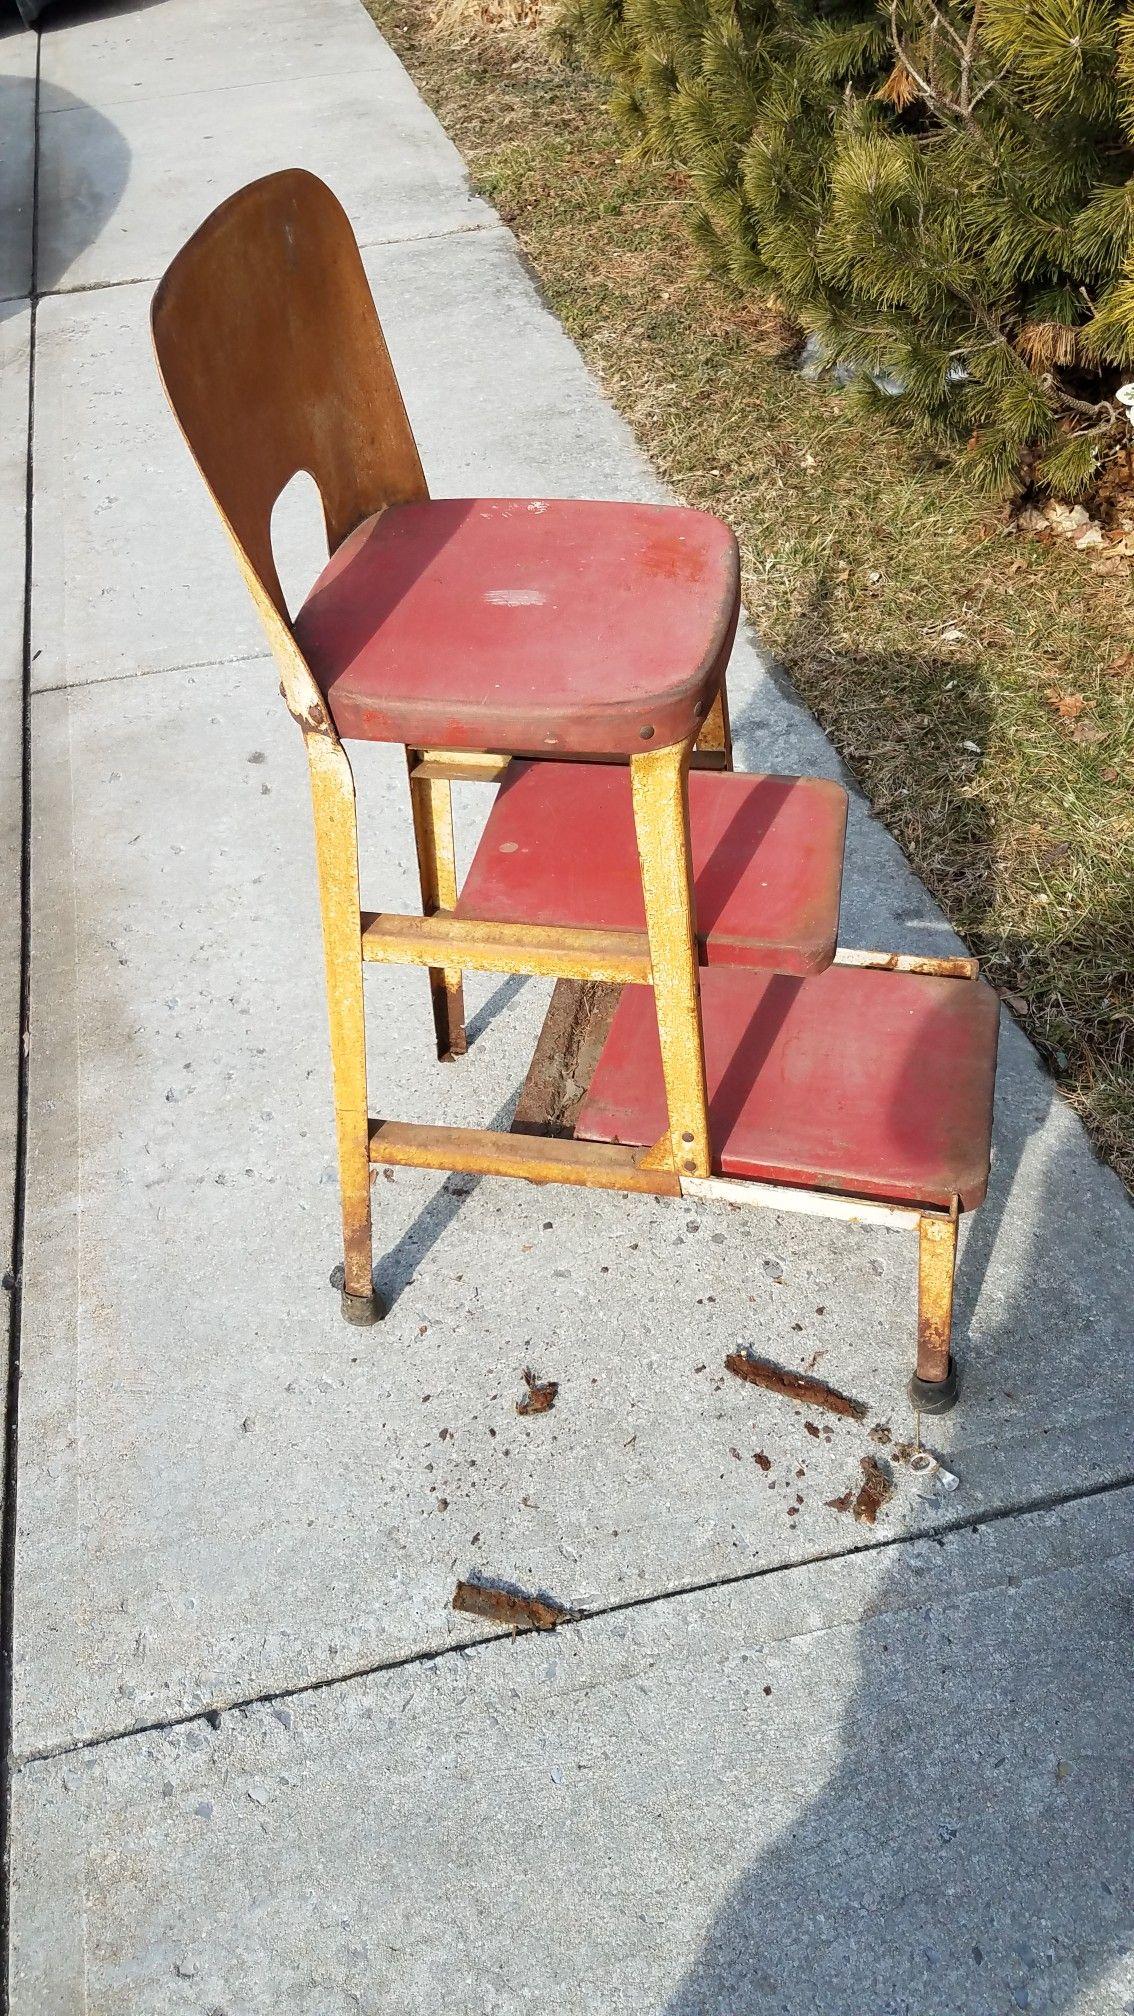 Incredible Vintage Metal Kitchen Step Stool Steps Slide Out Of Frame Uwap Interior Chair Design Uwaporg